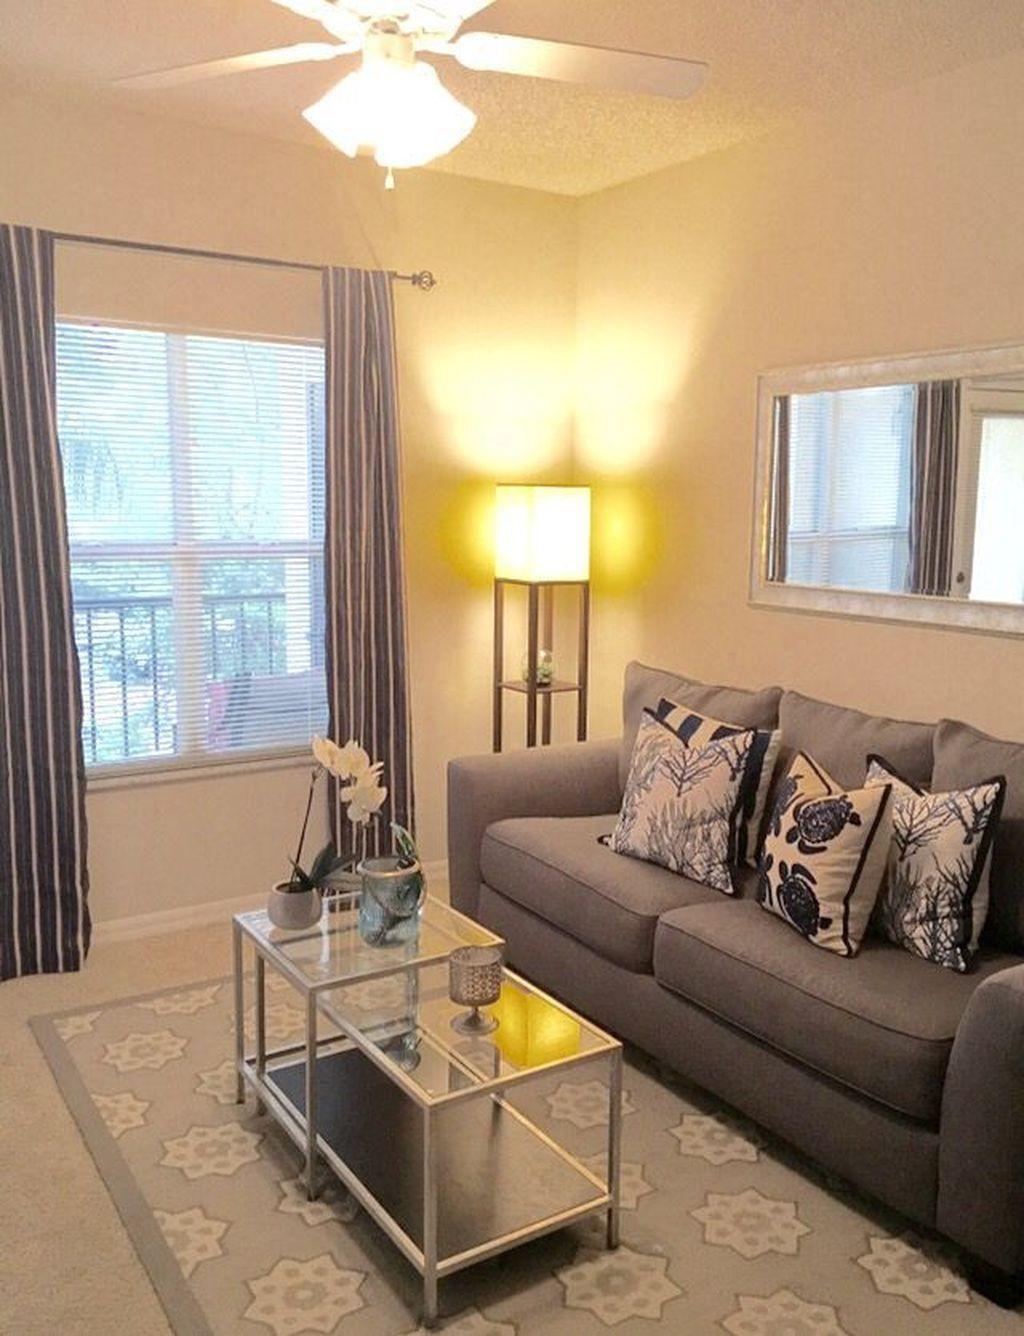 20 Inspiring New Apartment Decorating Ideas On A Bu